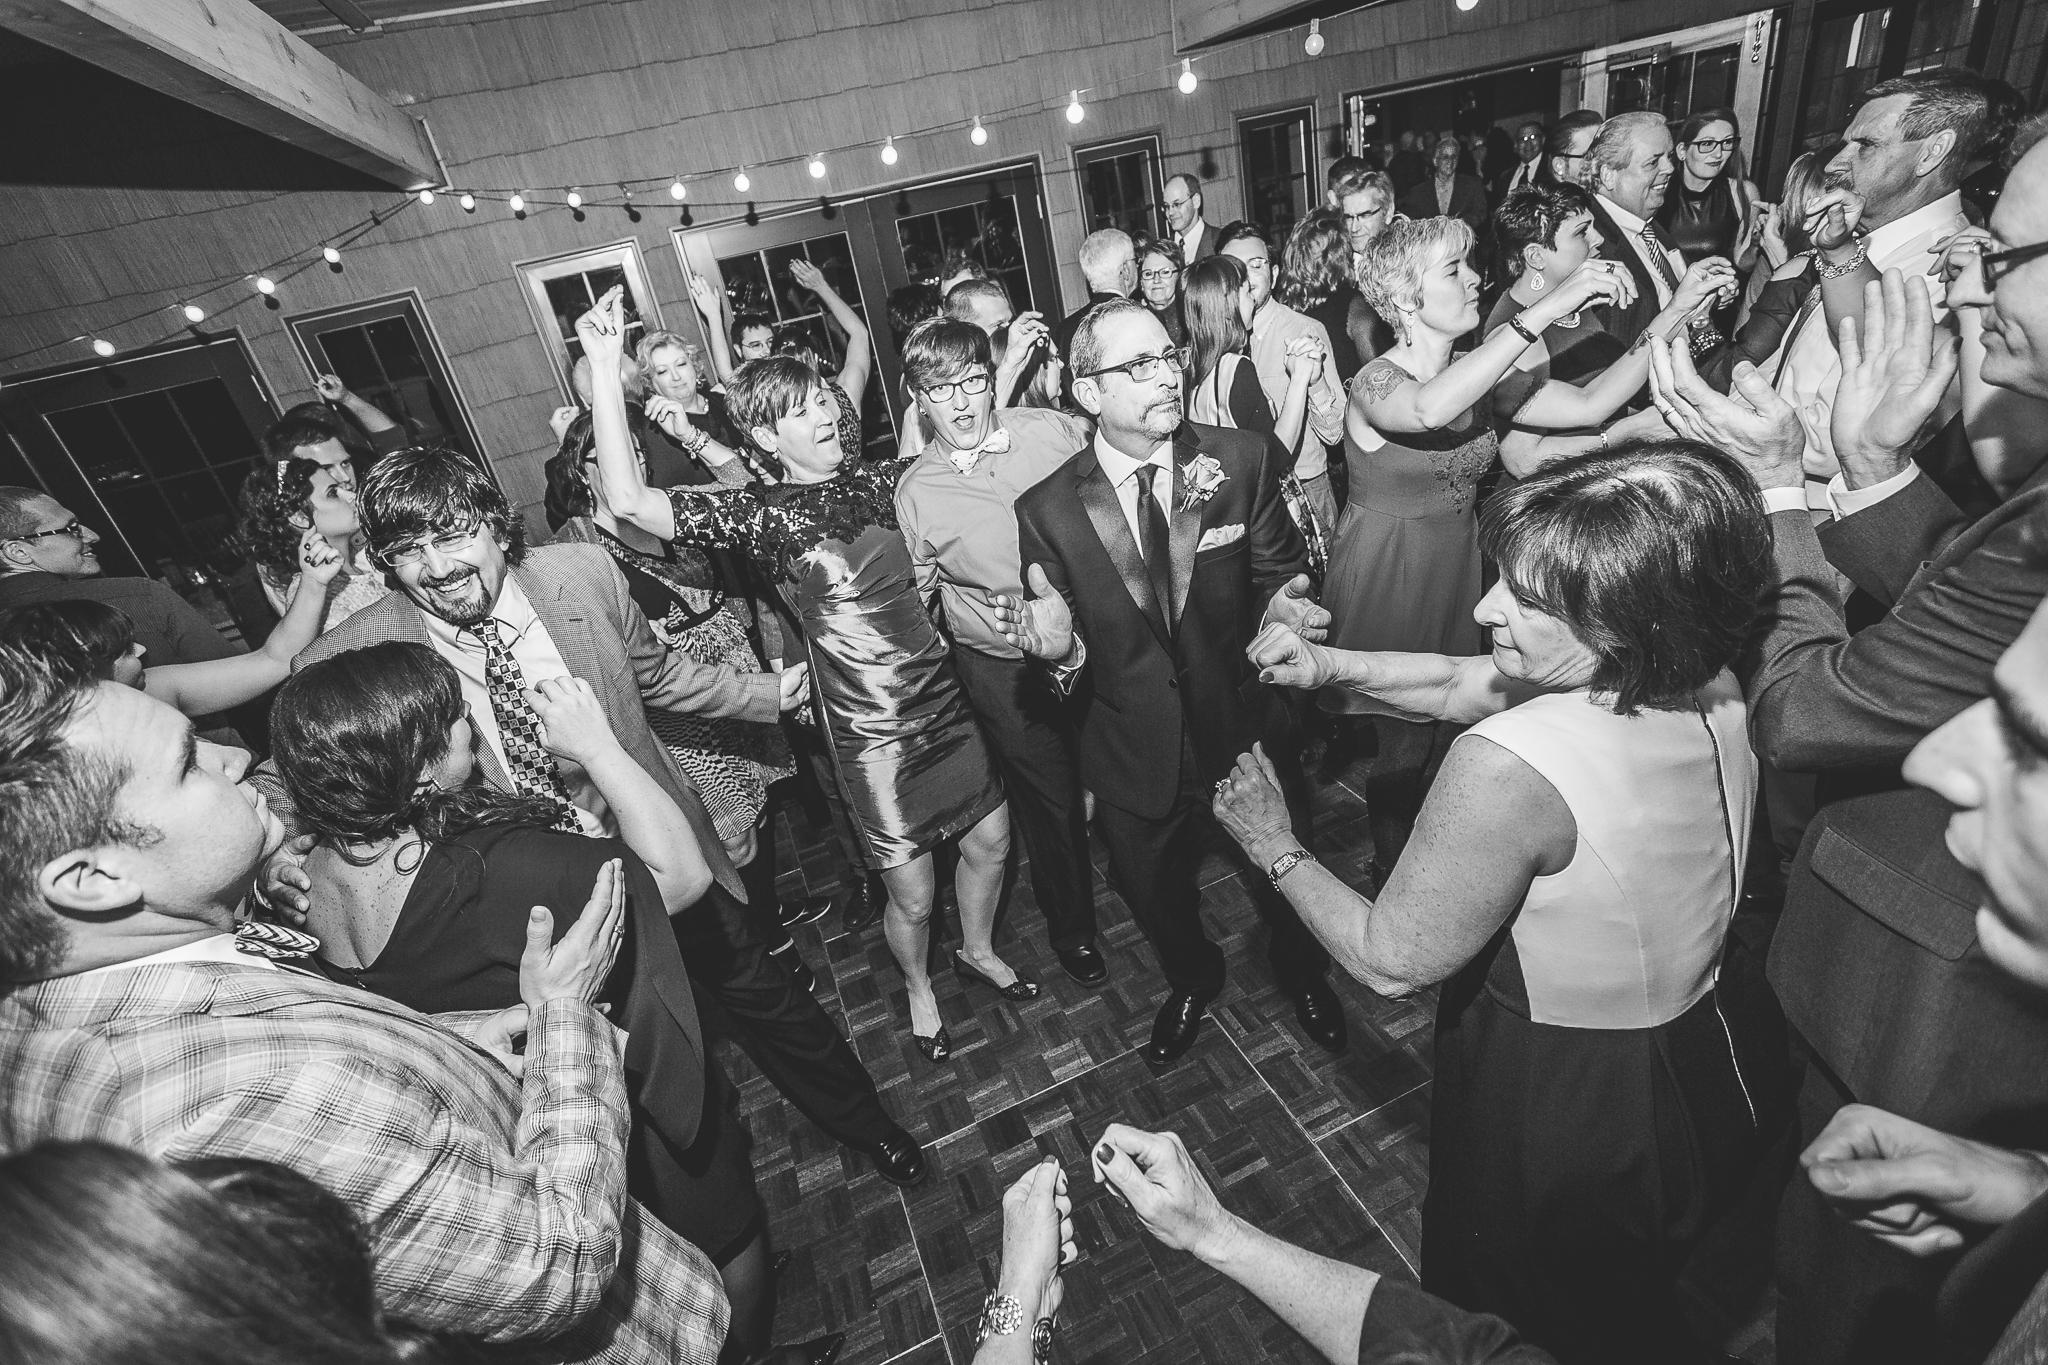 camuglia-whomstudio-chelsea_and_andy-nycphotographer-wedding-brooklyn-buffalo-timberlodge-158-5695.jpg